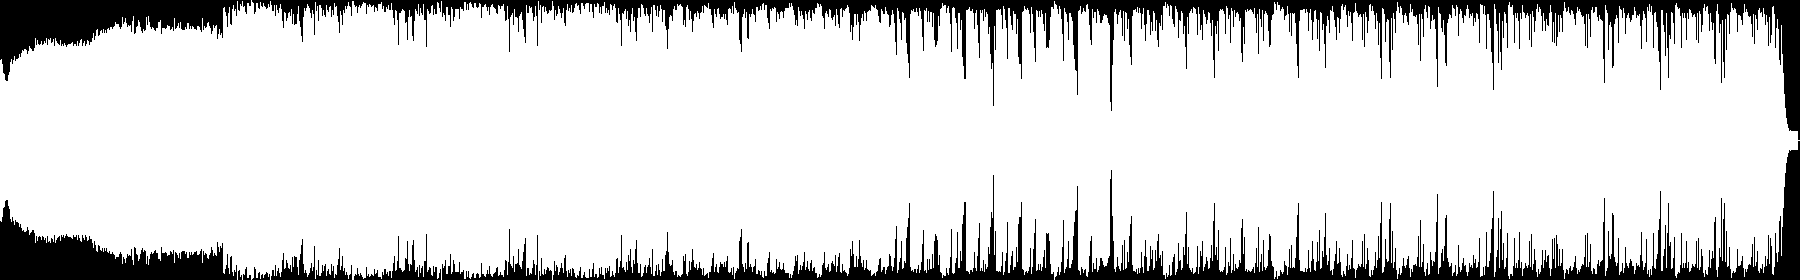 Necropolis audio waveform